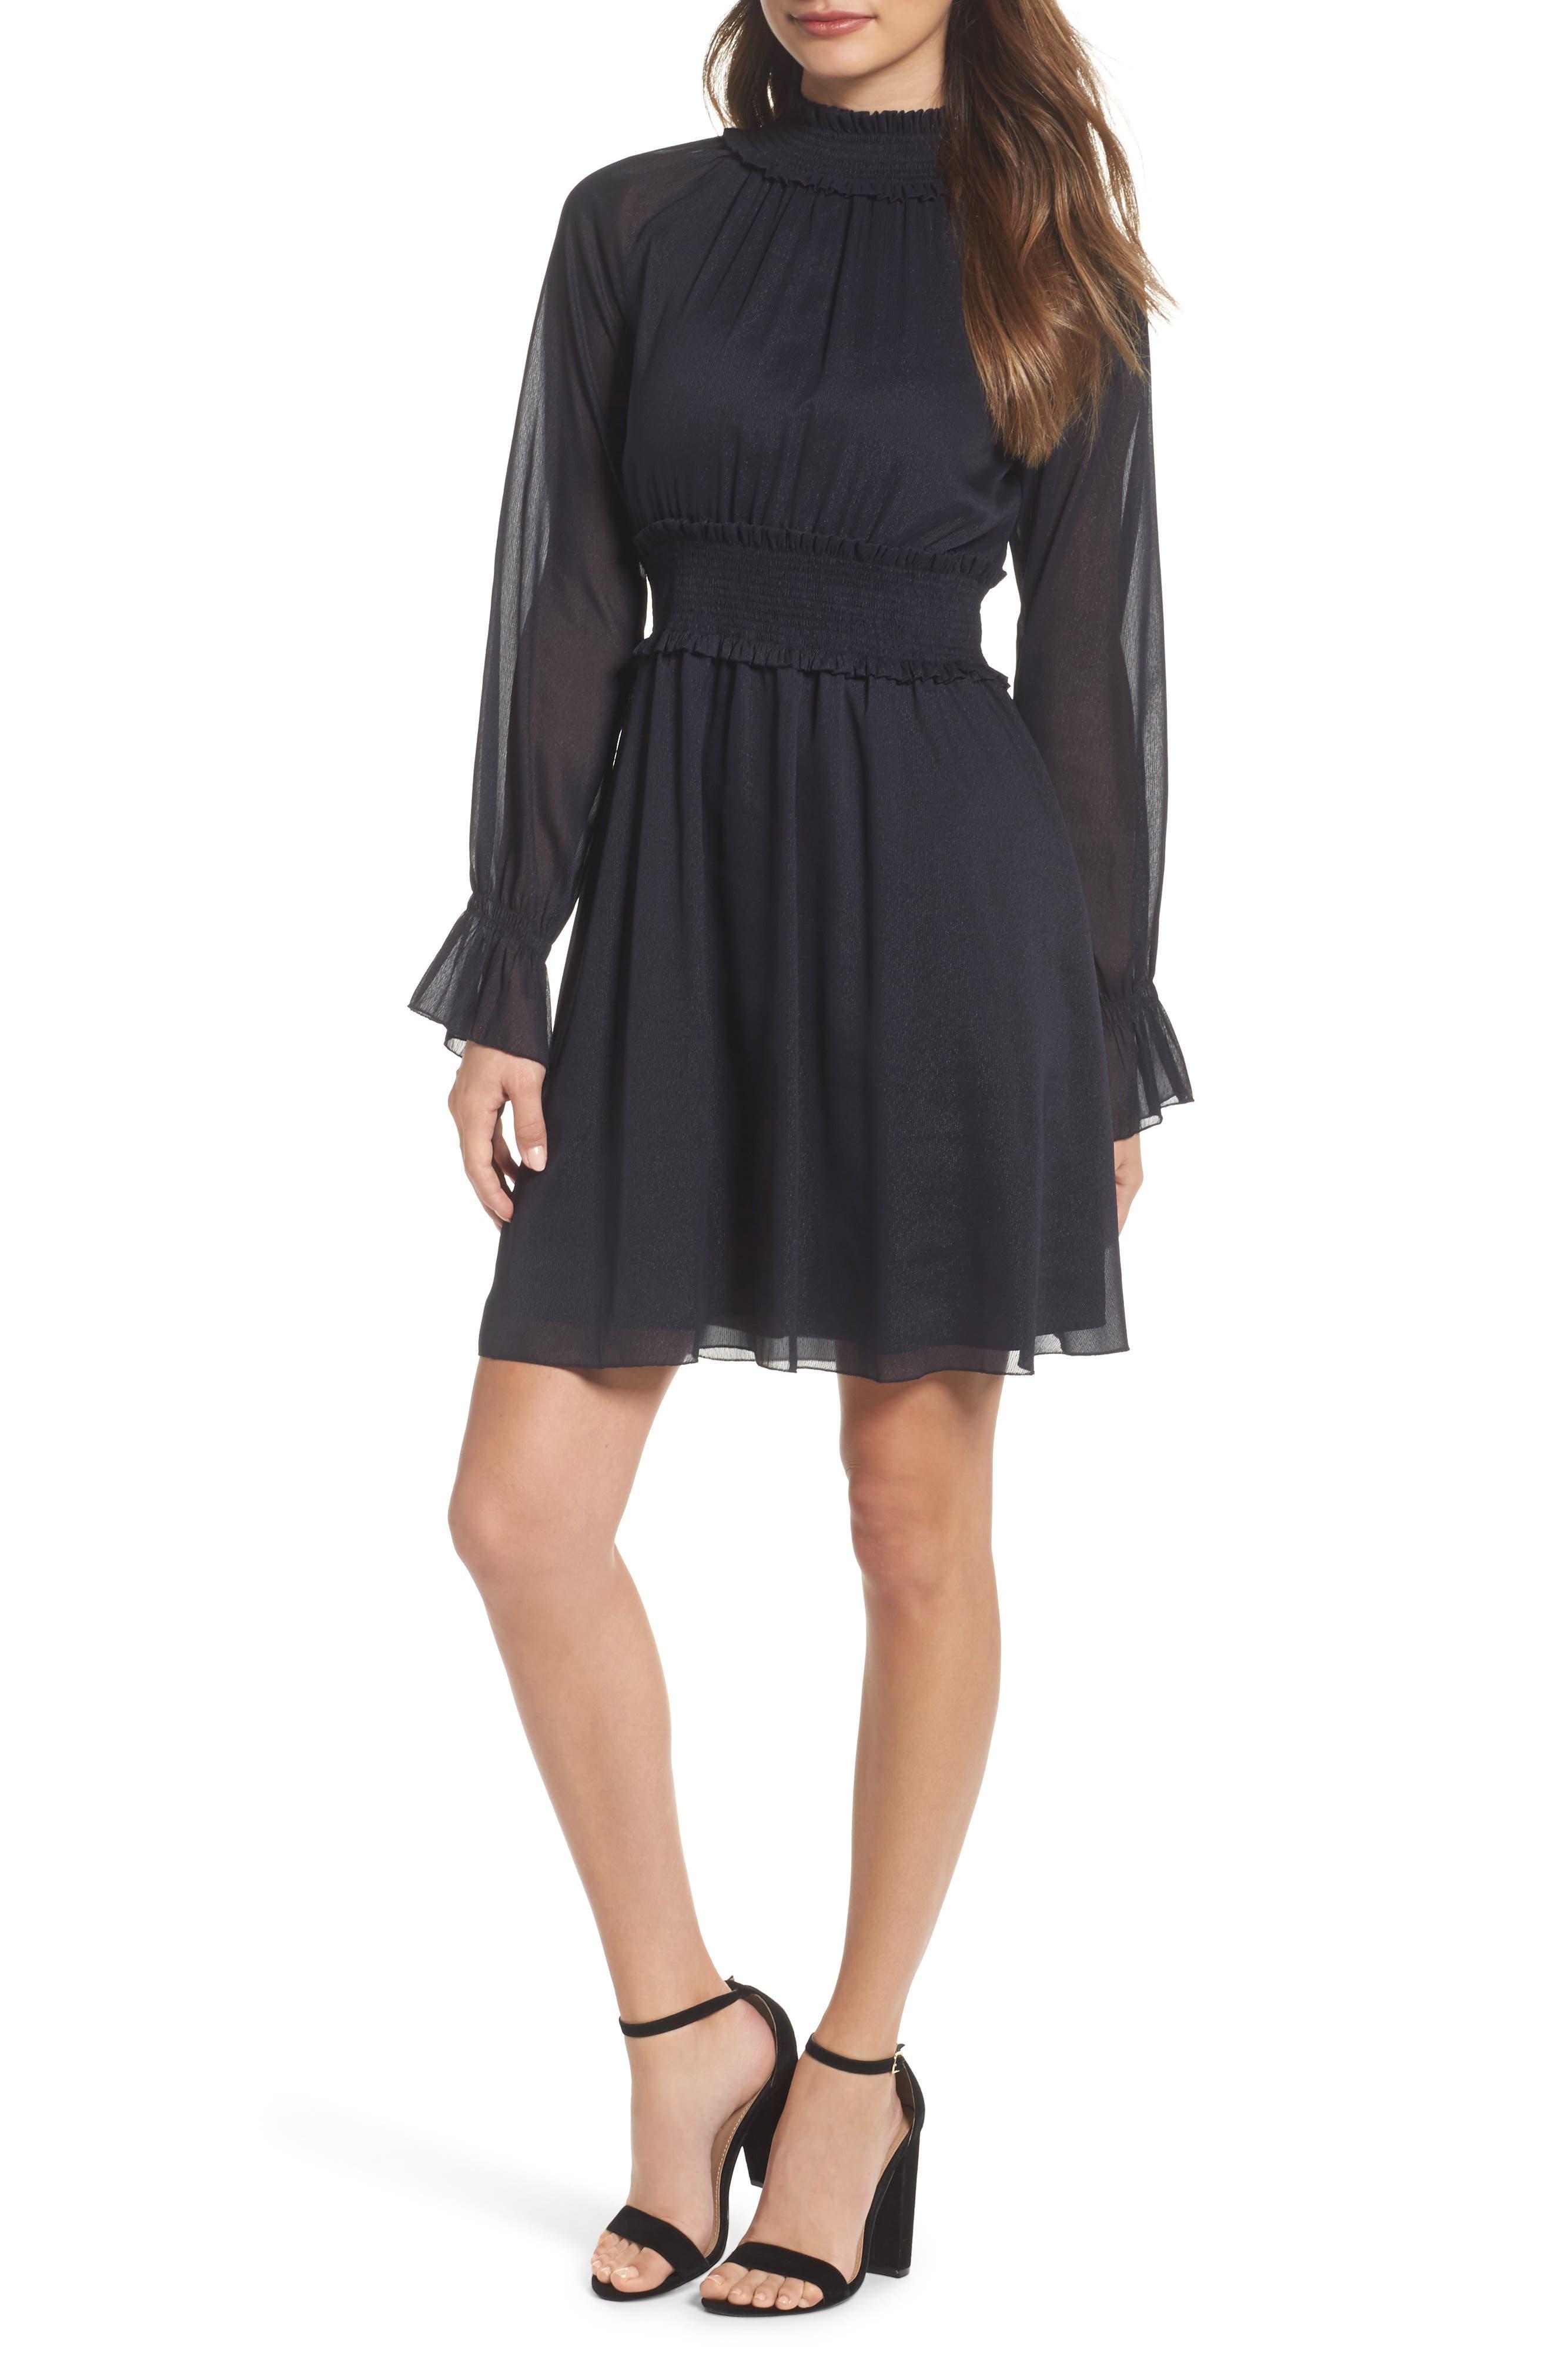 Main Image - Chelsea28 Smocked Long Sleeve Dress